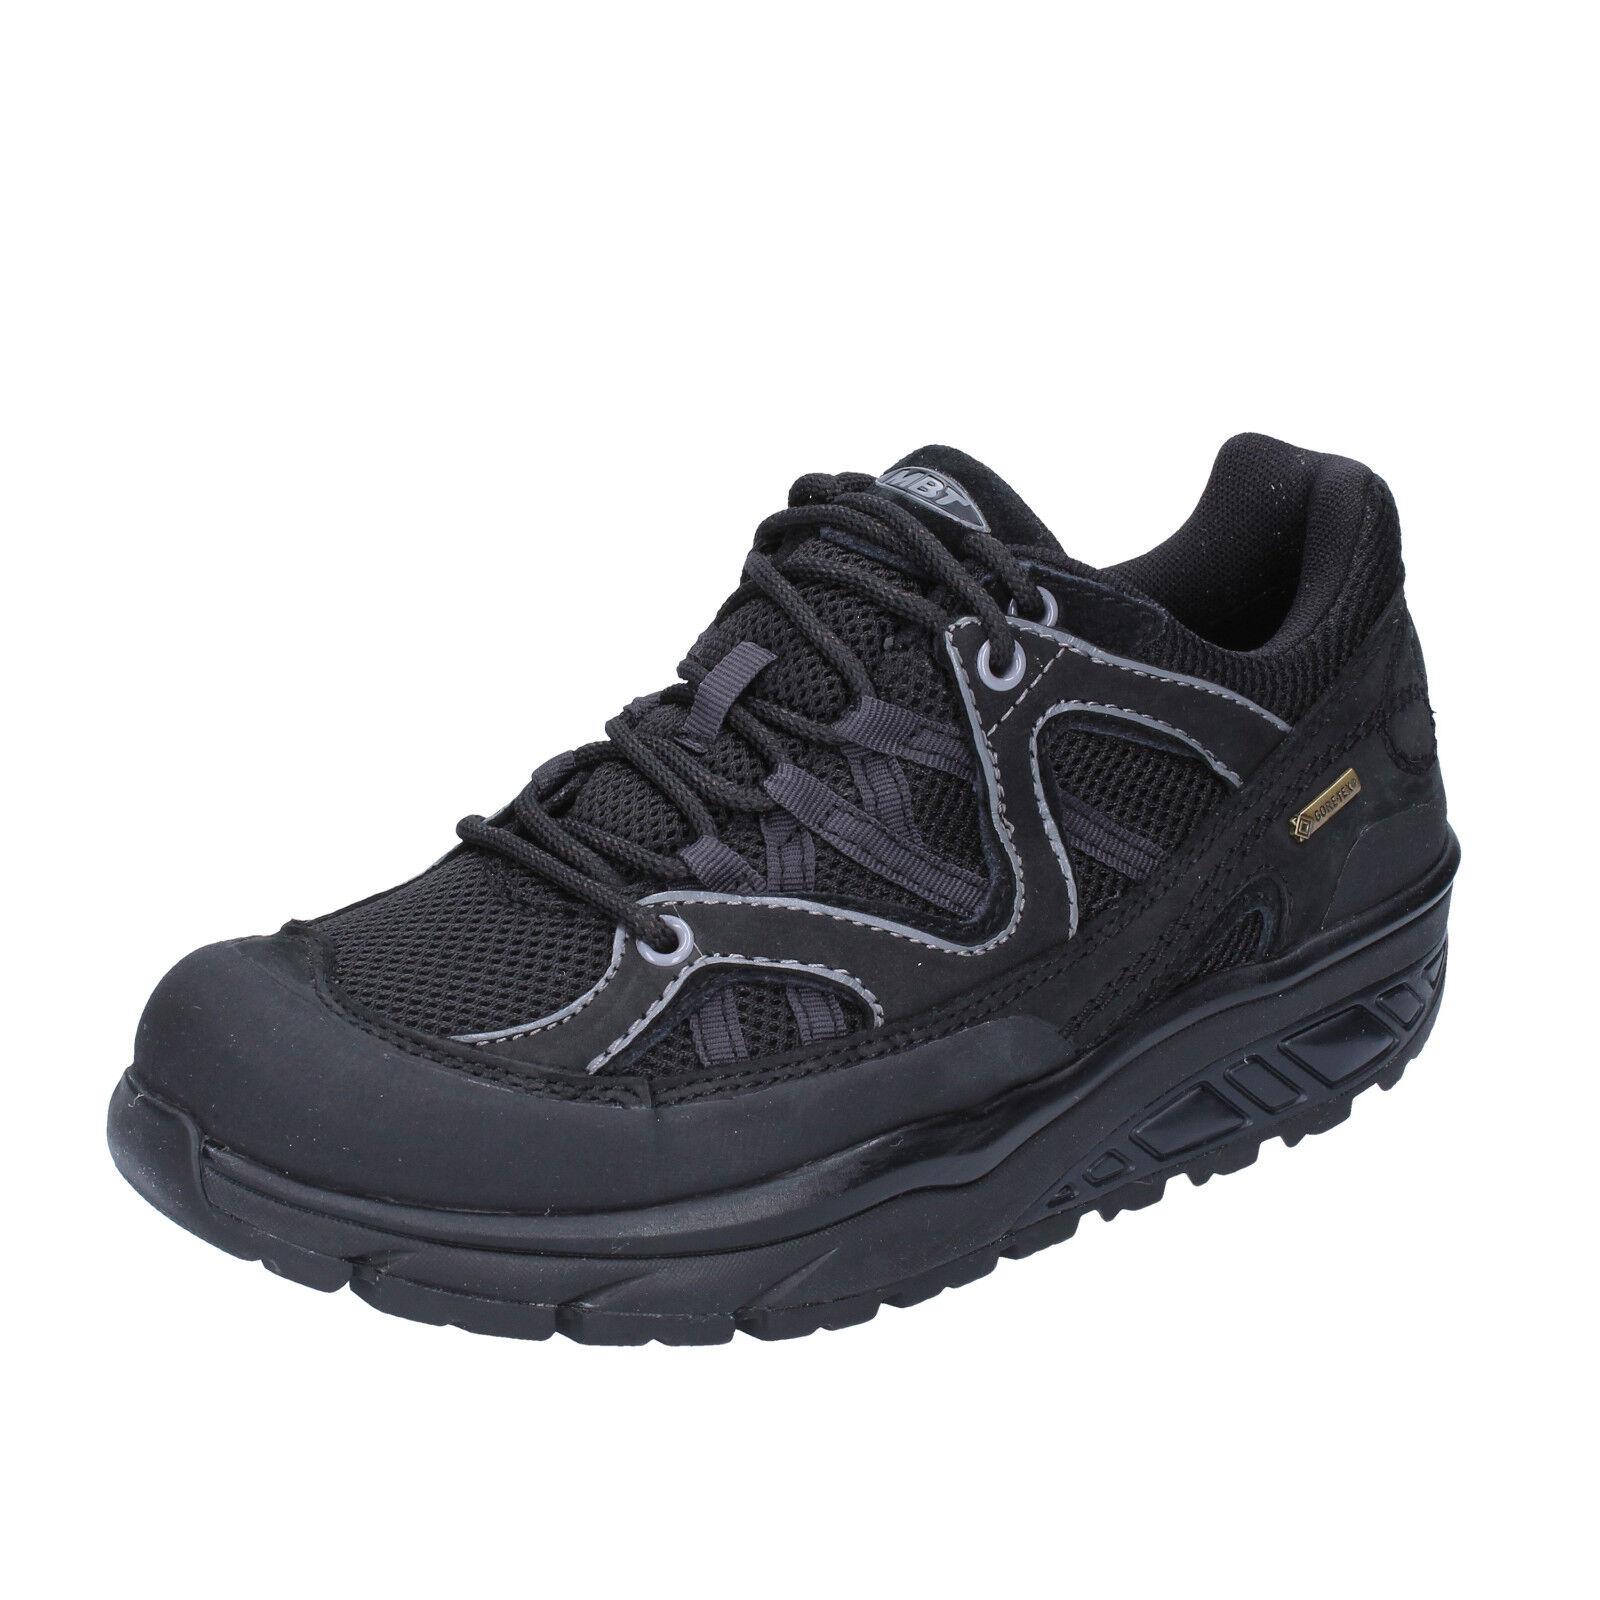 scarpe sneakers donna MBT 36 EU sneakers scarpe nero nabuk tessuto dynamic BT191-36 259fbd